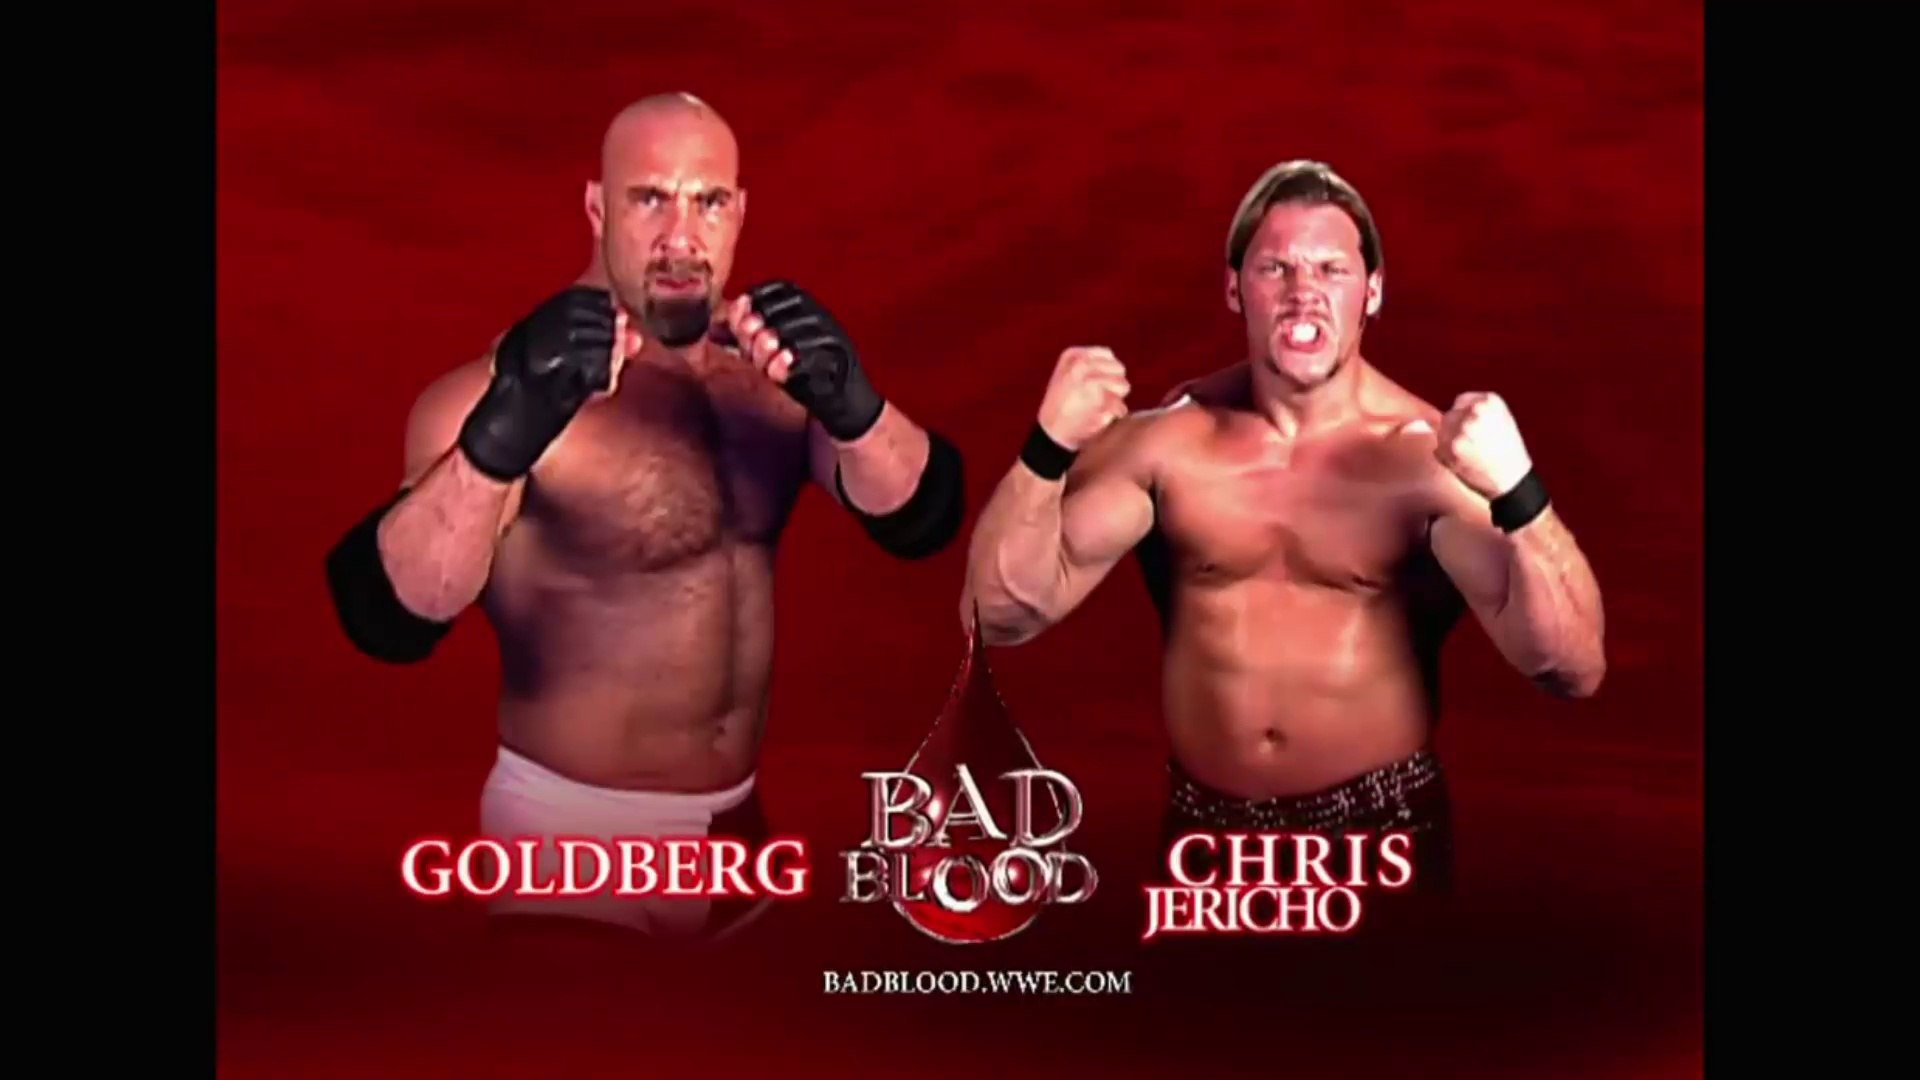 Image result for WWE Bad Blood 2003 Goldberg vs Jericho